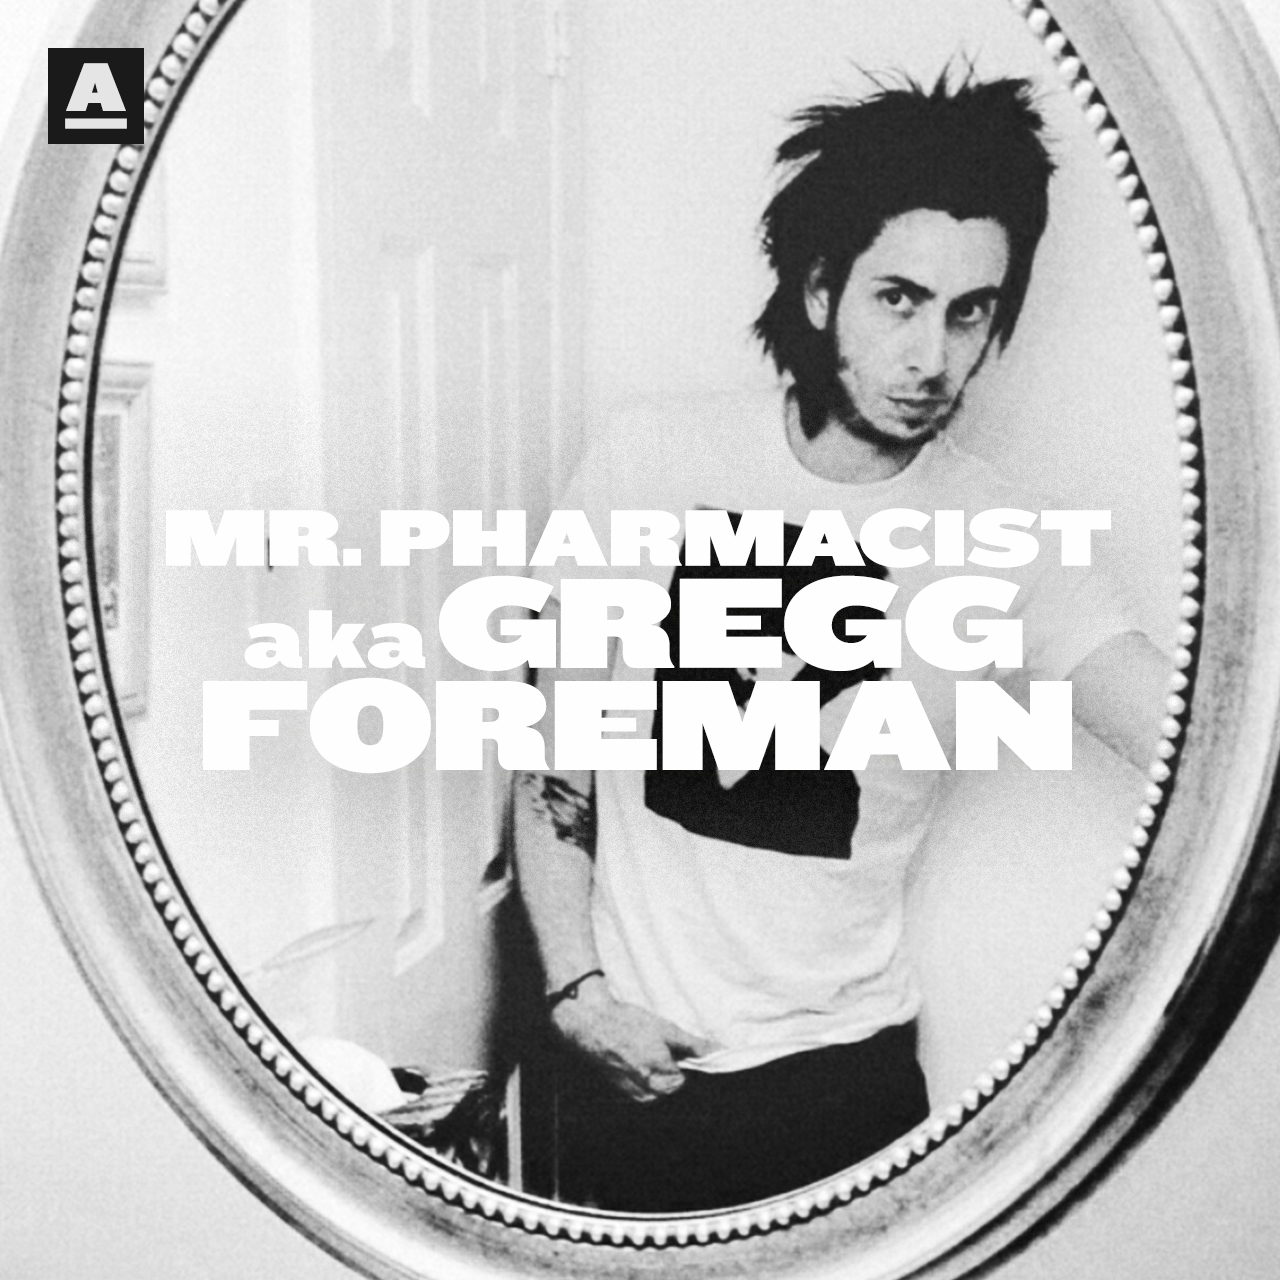 Mr. Pharmacist aka Gregg Foreman presents 'You Haven't Found It Yet' #016